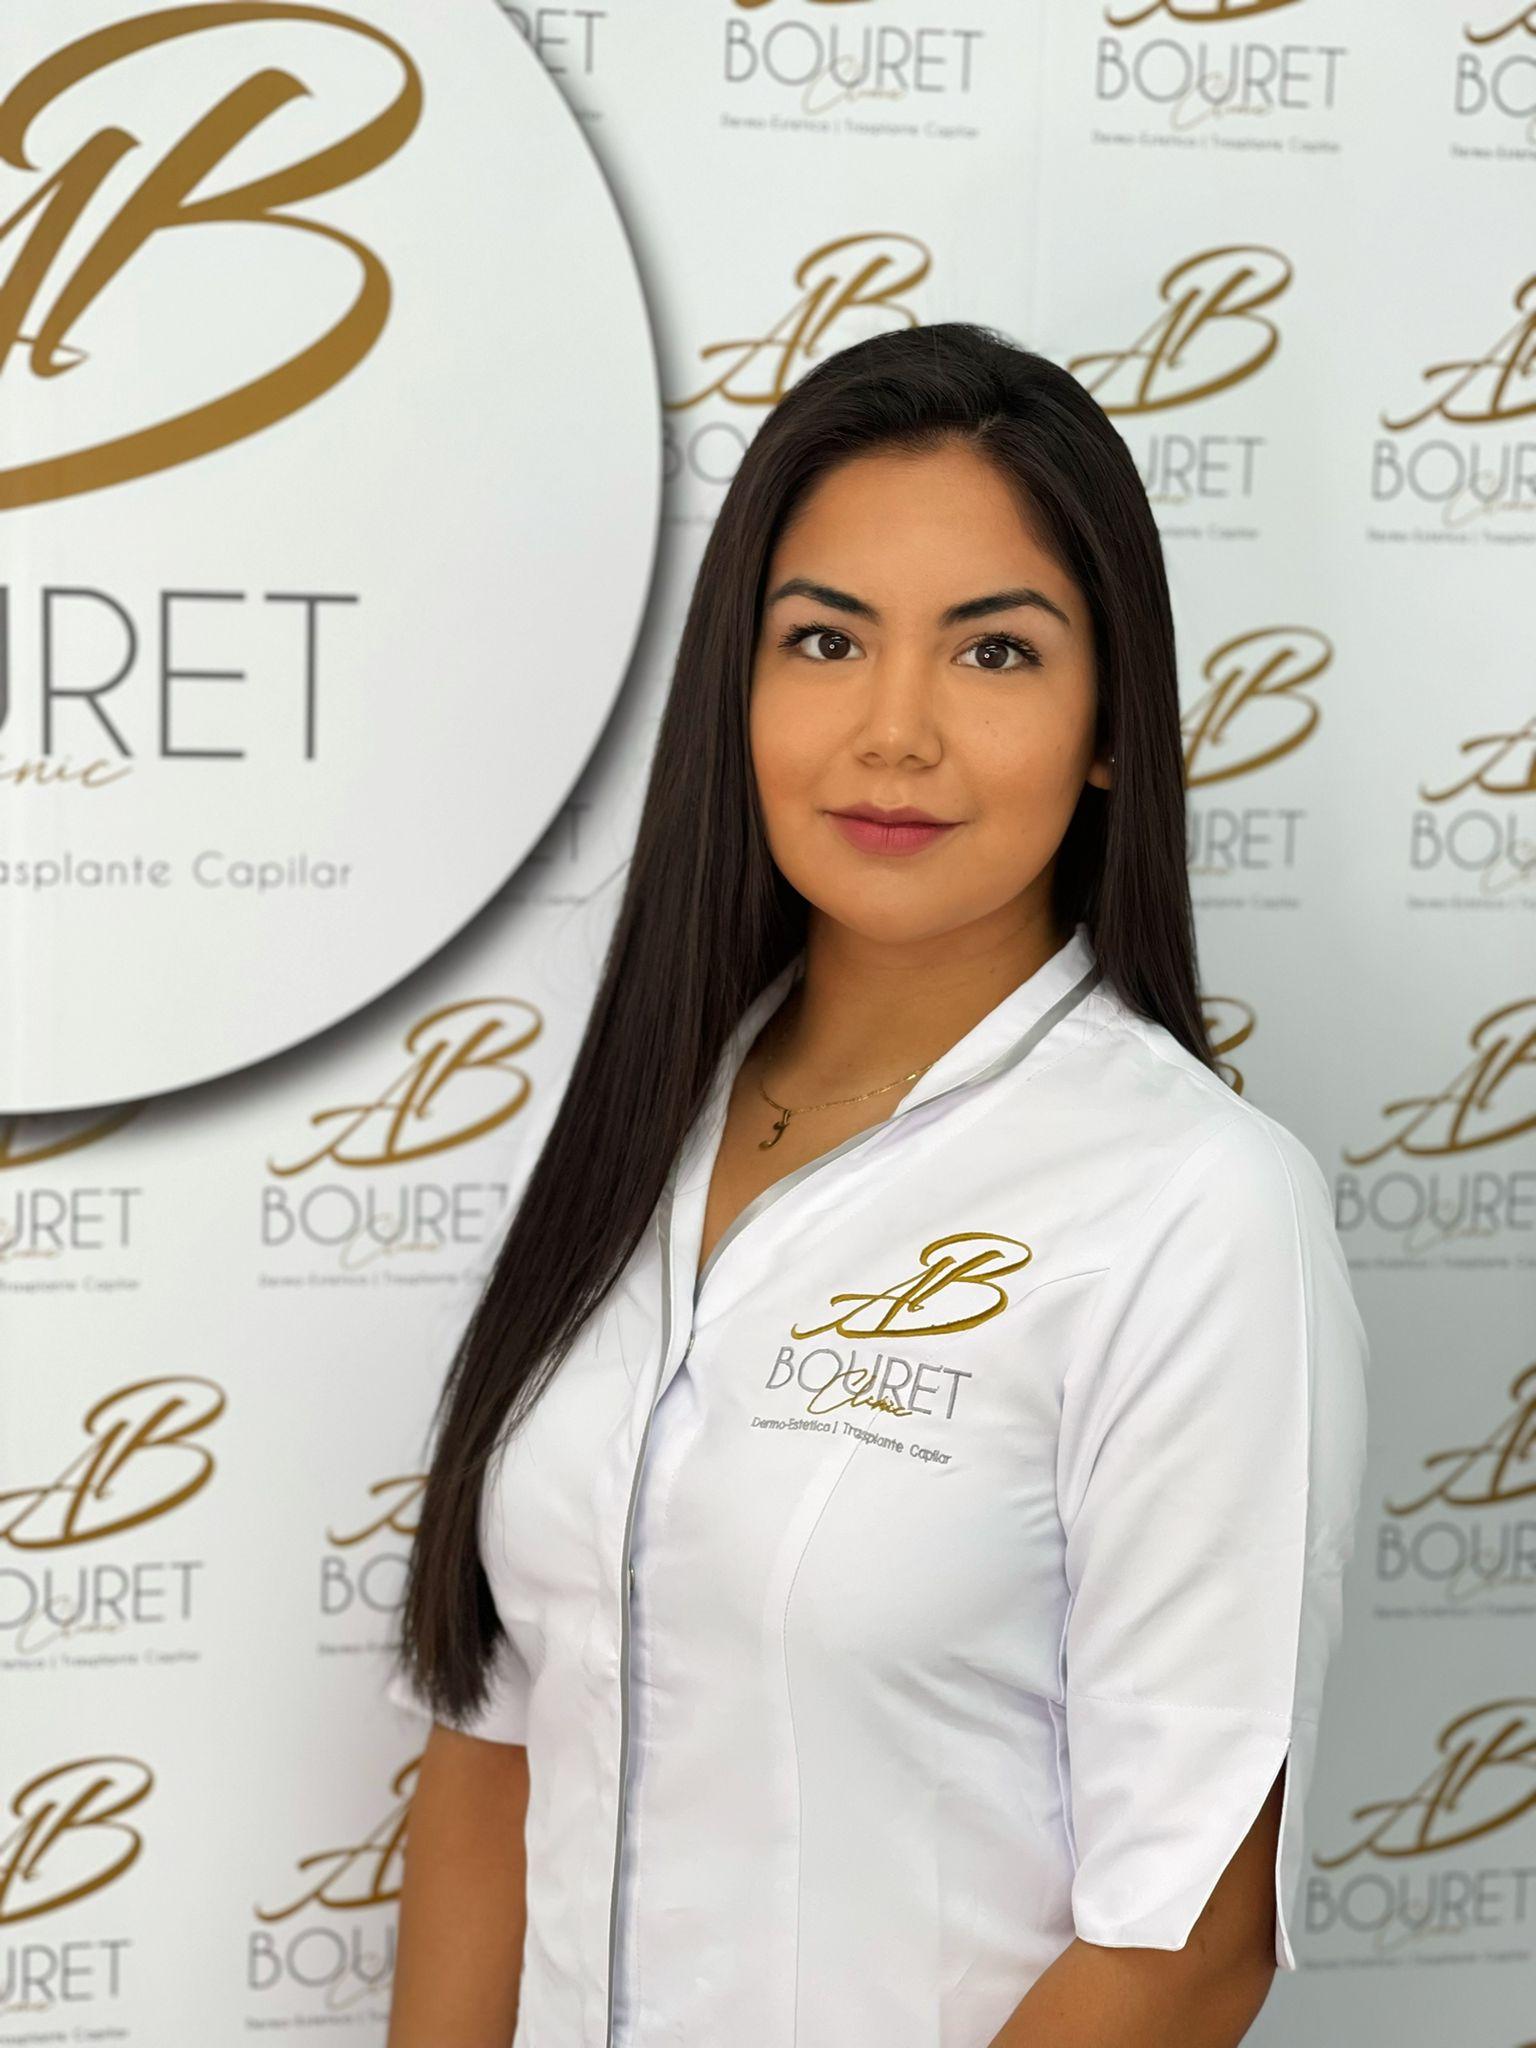 JIMENA - Bouret Clinic